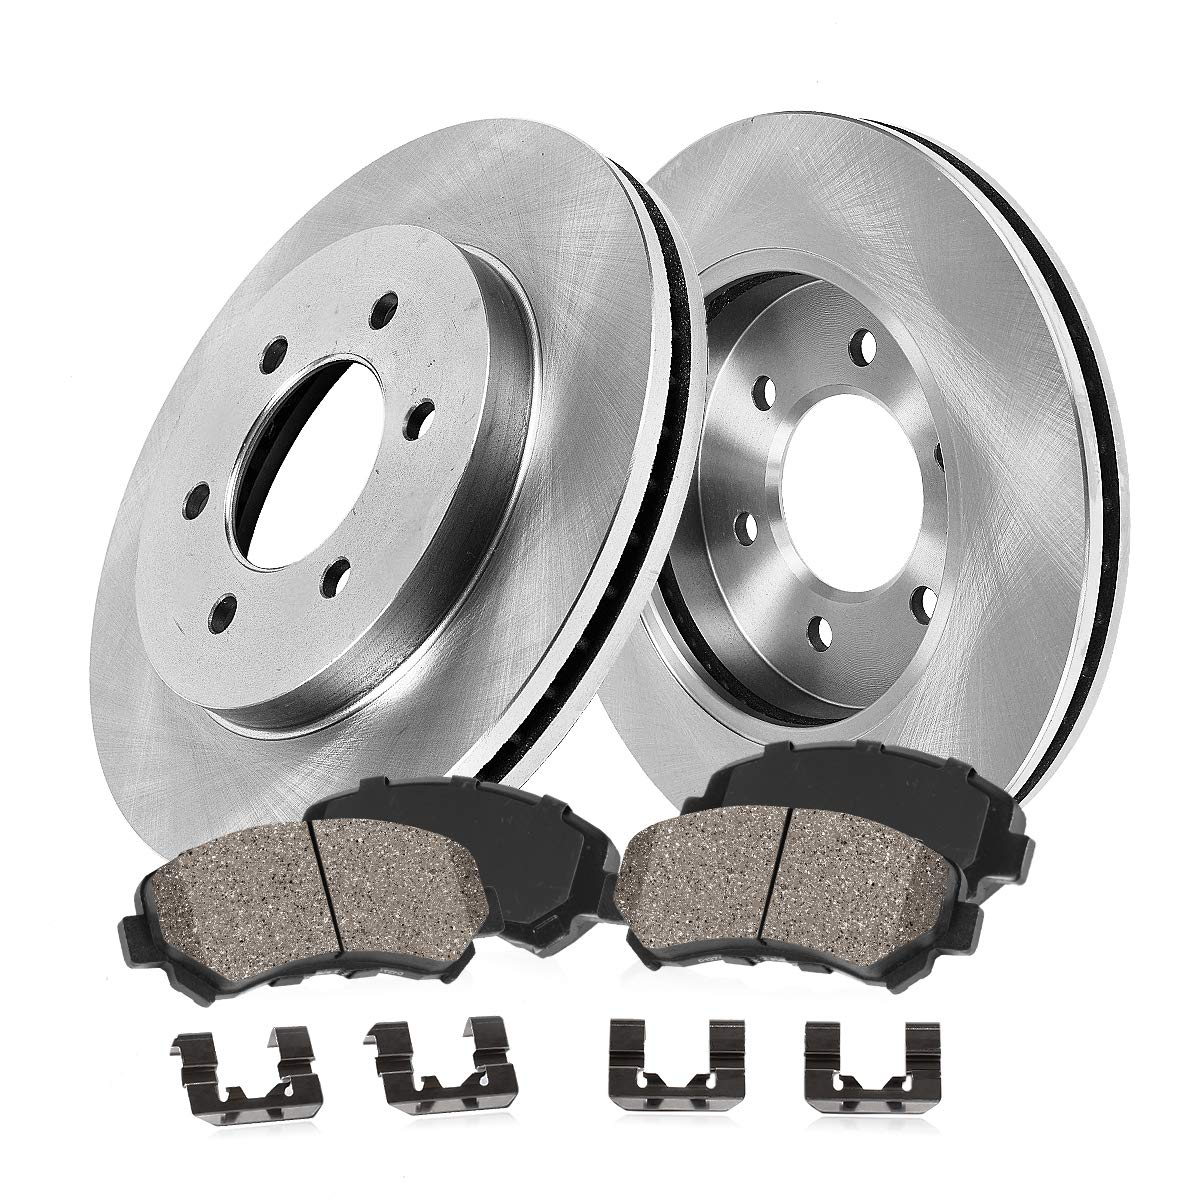 FRONT 287 mm Premium OE 6 Lug 2 Brake Disc Rotors + Pickup SUV Series Ceramic Brake Pads 4 Clips